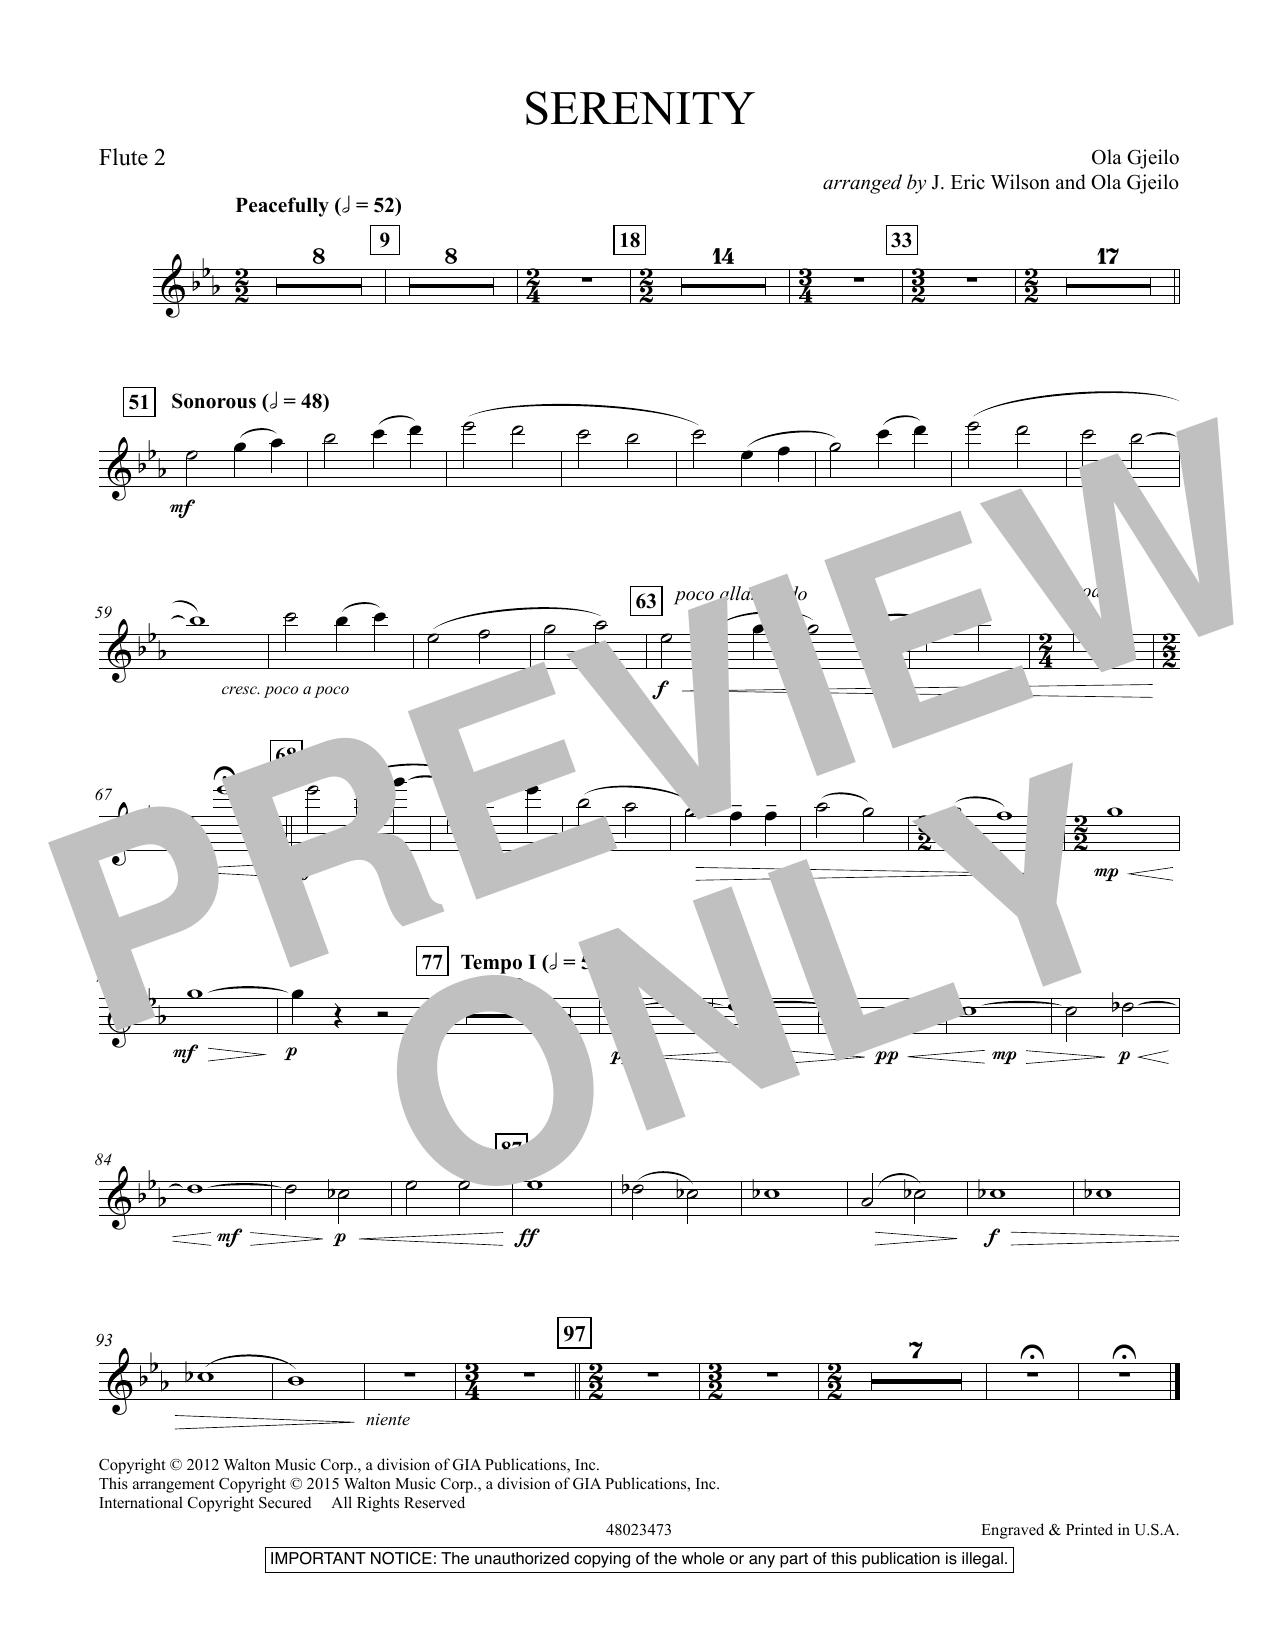 Serenity - Flute 2 (Concert Band)